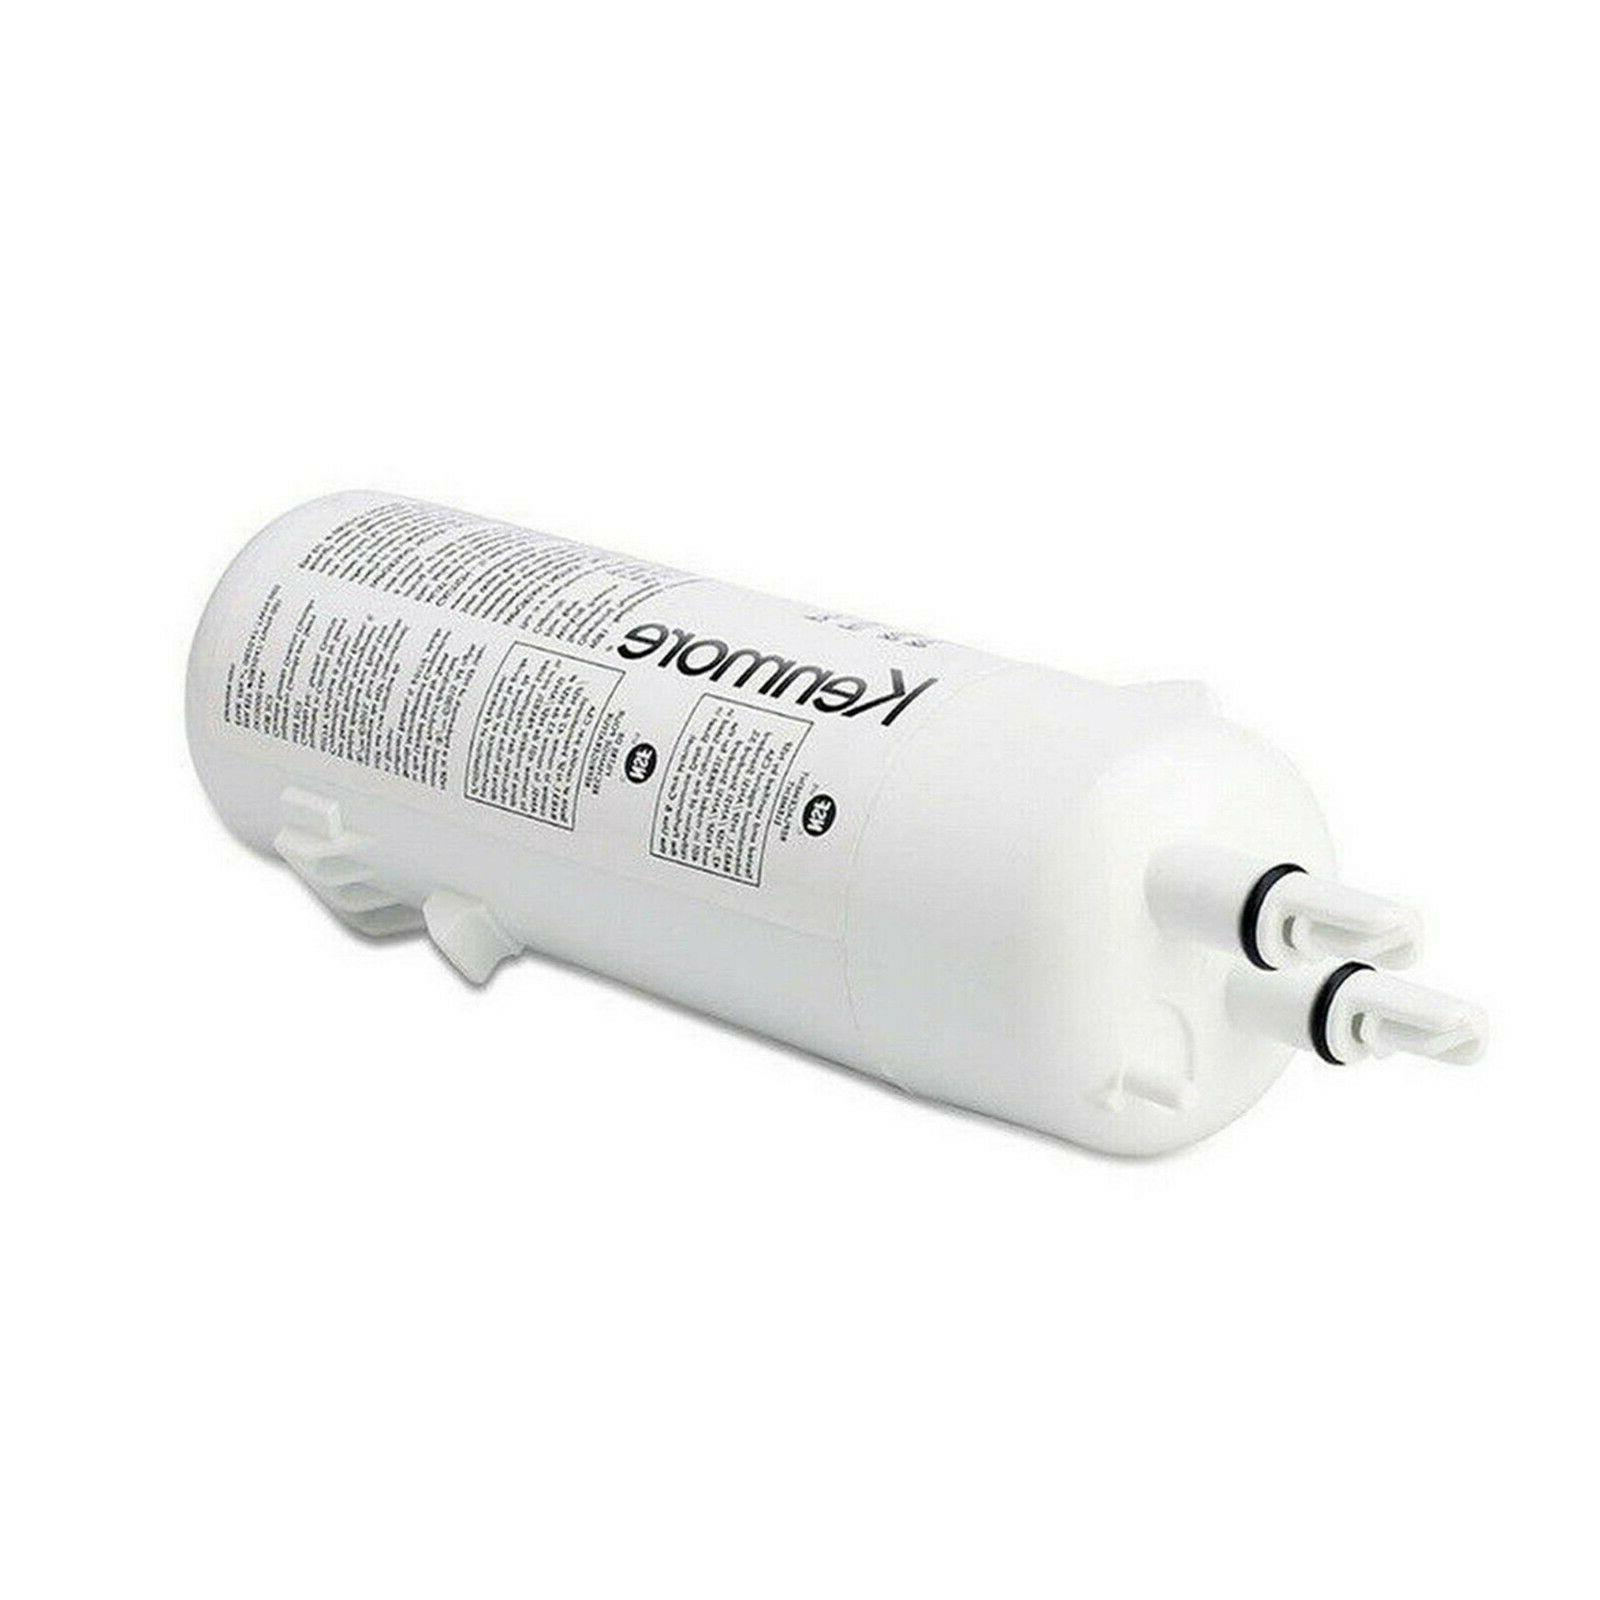 1 Kenmore Replacement Refrigerator Filter 46-9081